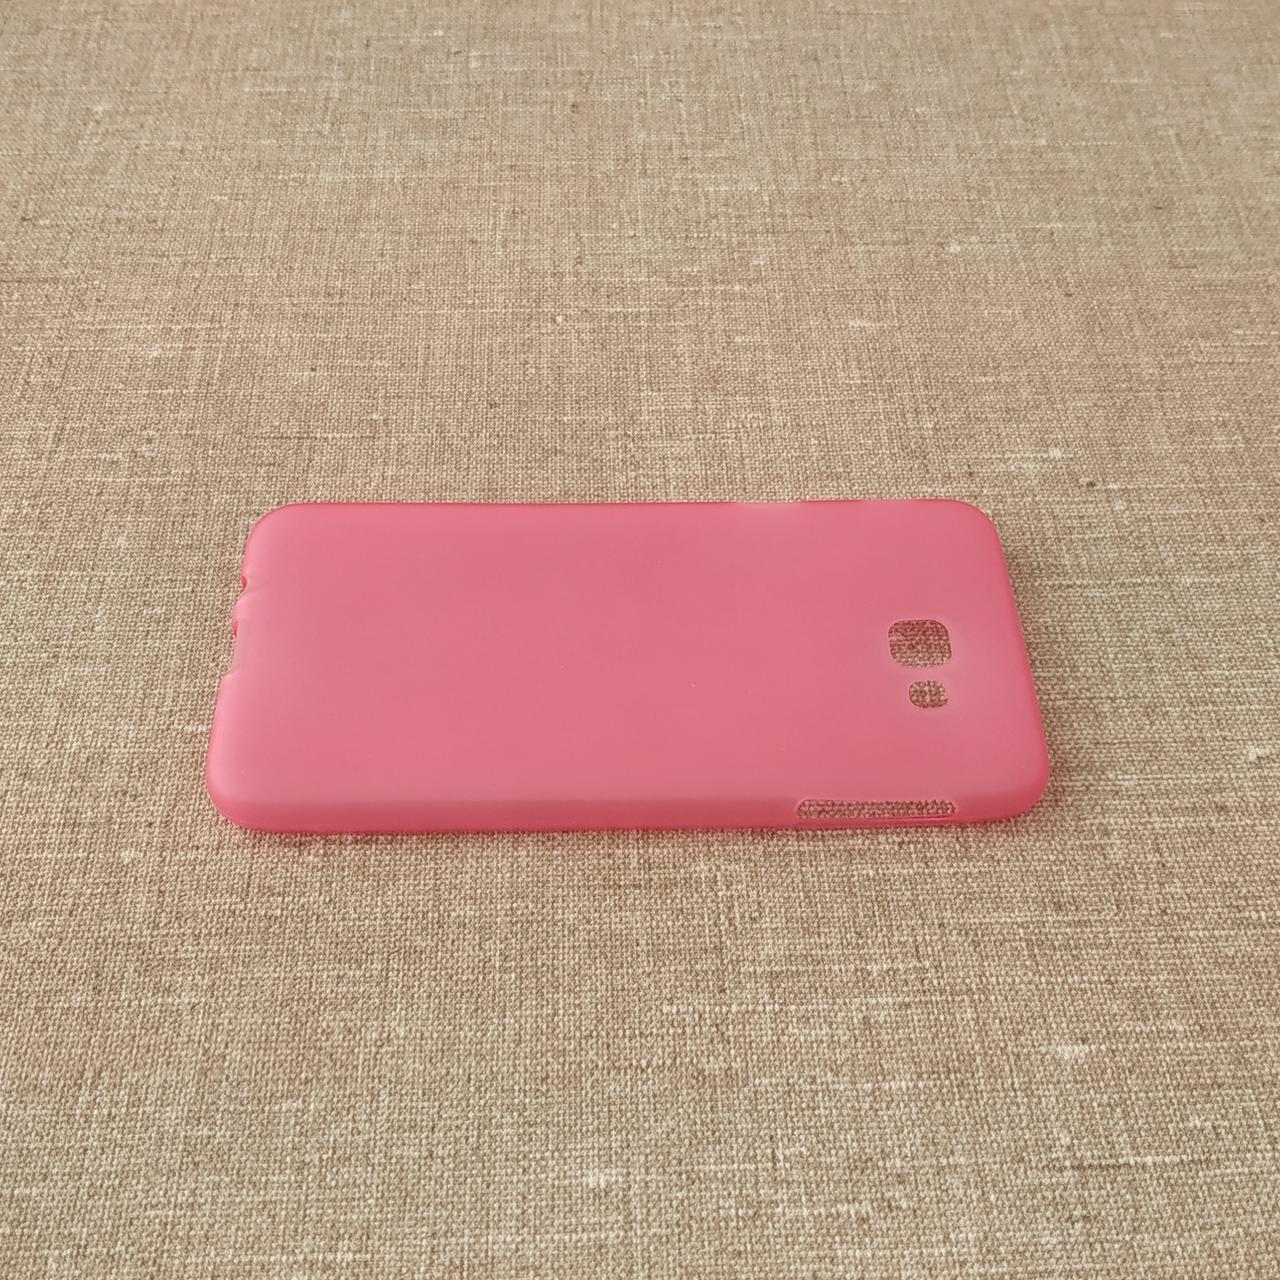 Чехлы для Galaxy J Prime Series TPU Samsung J5 G570 pink (J530) 2017